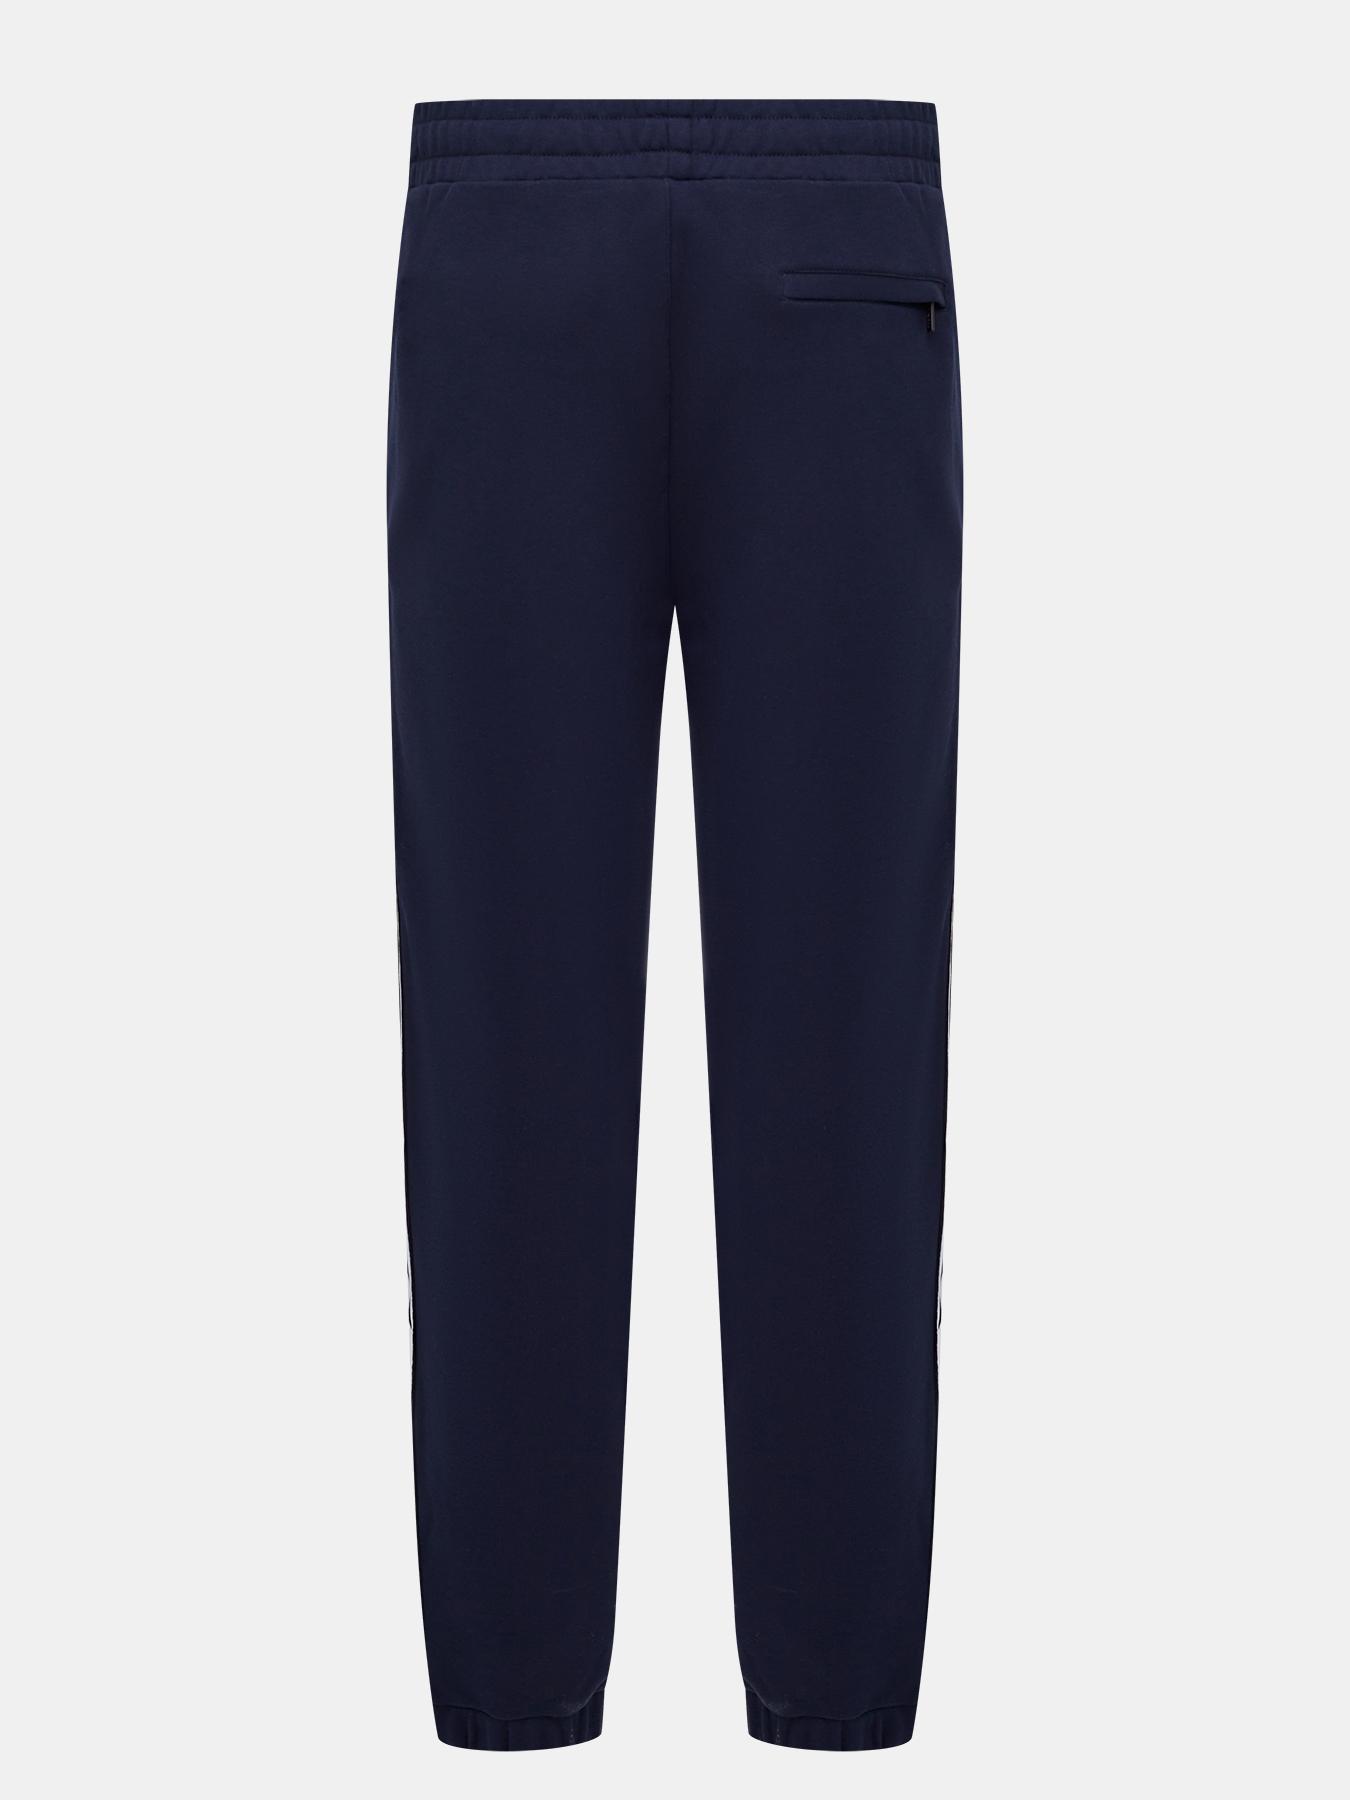 Брюки Karl Lagerfeld Спортивные брюки брюки спортивные sugarlife sugarlife mp002xw0xjil